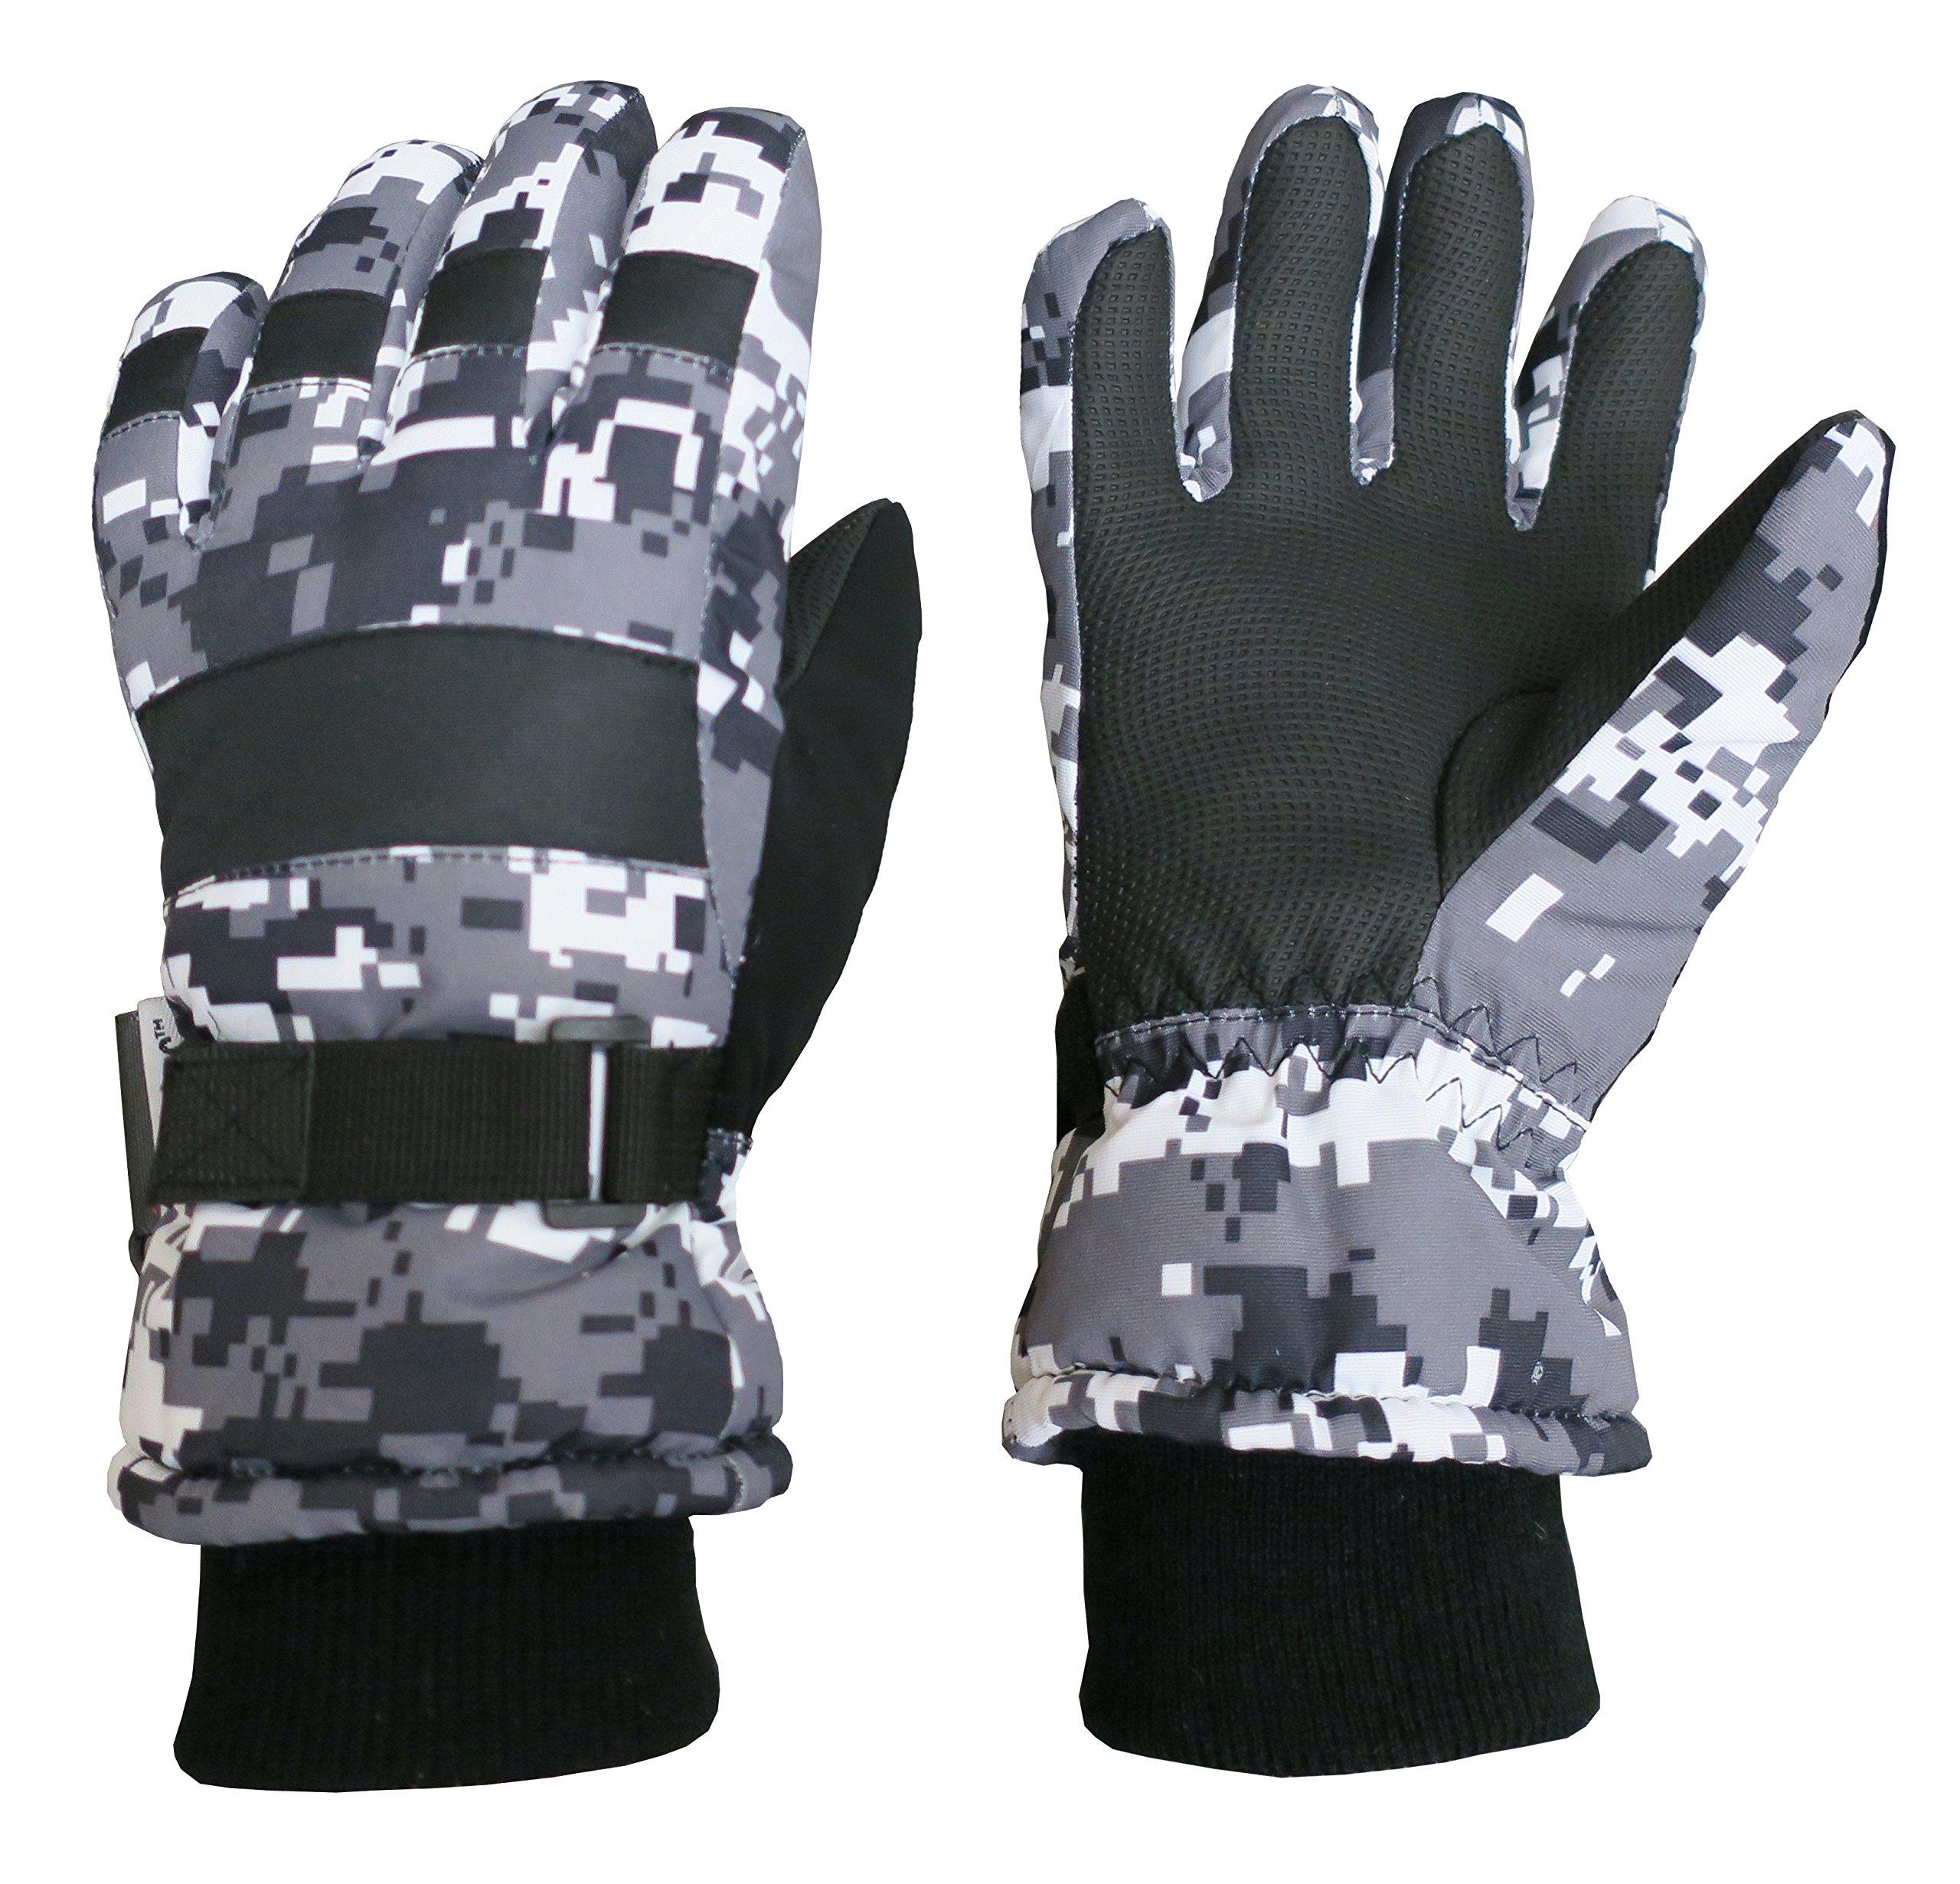 N'Ice Caps Kids Cold Weather Waterproof Camo Print Thinsulate Ski Gloves (Black/Grey Digital Camo, 4-5 Years)